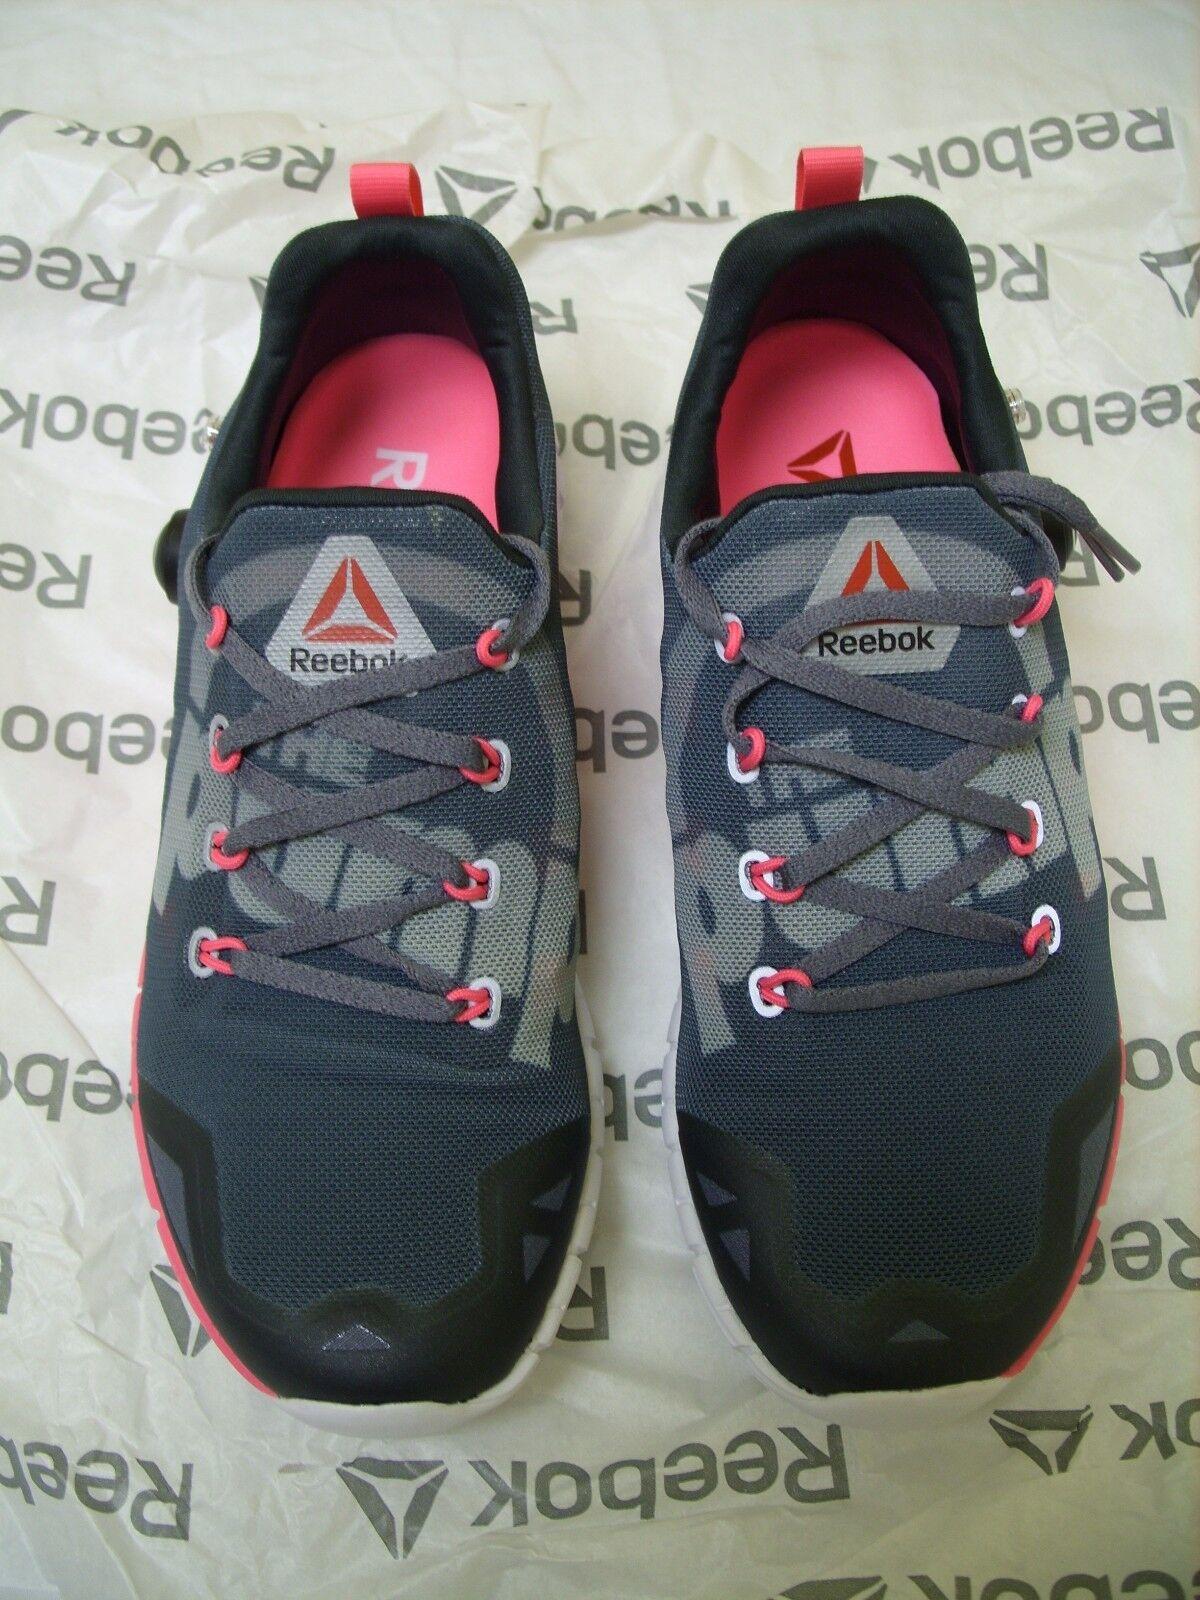 97d3a234234 Reebok ZPUMP Fusion 2.0 Running Women s Shoes Size 6